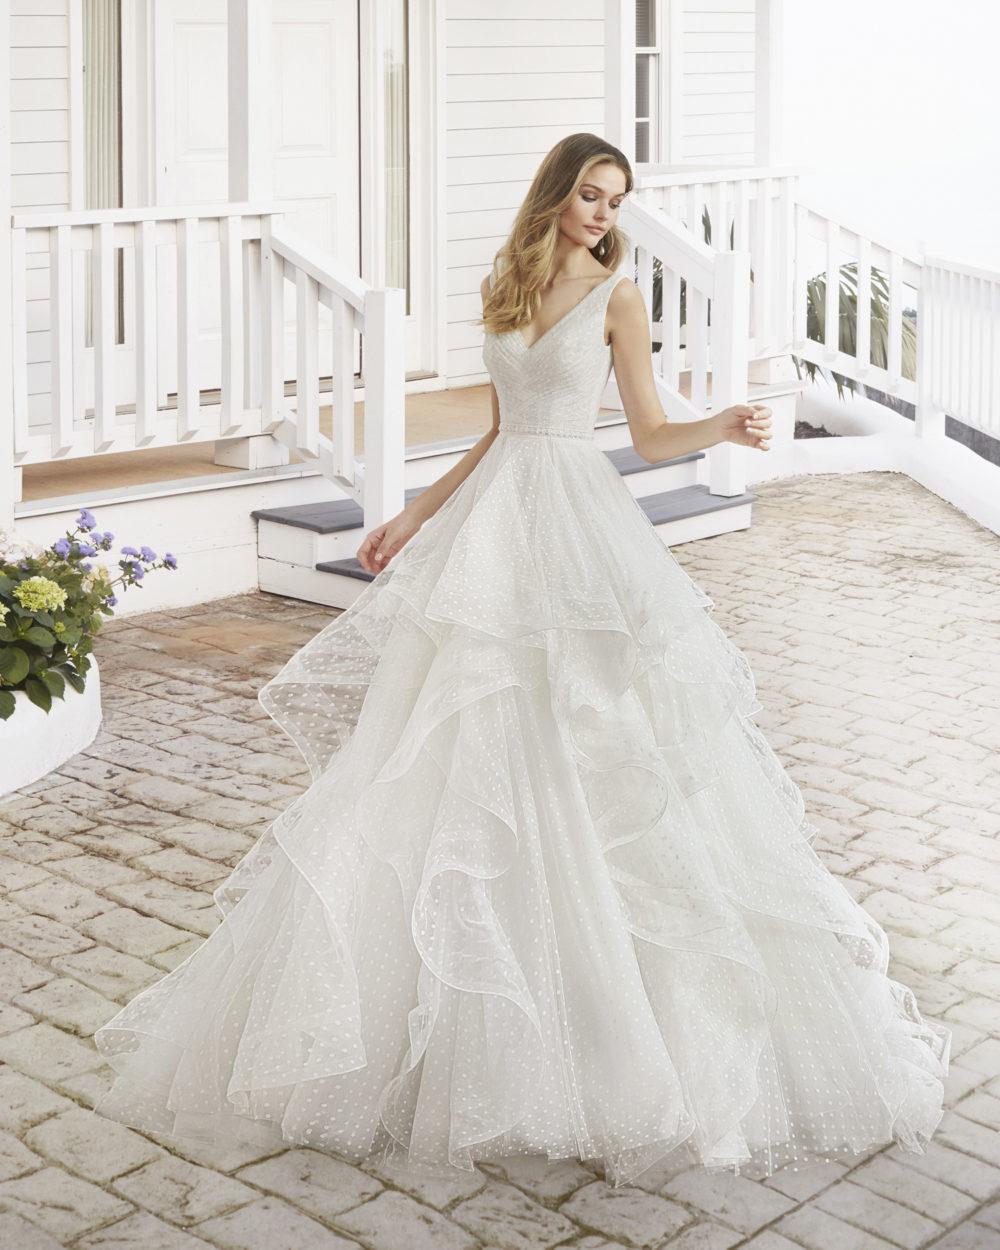 Mariages: abito da sposa Rosa Clarà 2020 a Vicenza, Verona, Padova, Veneto 4A186 COLBY